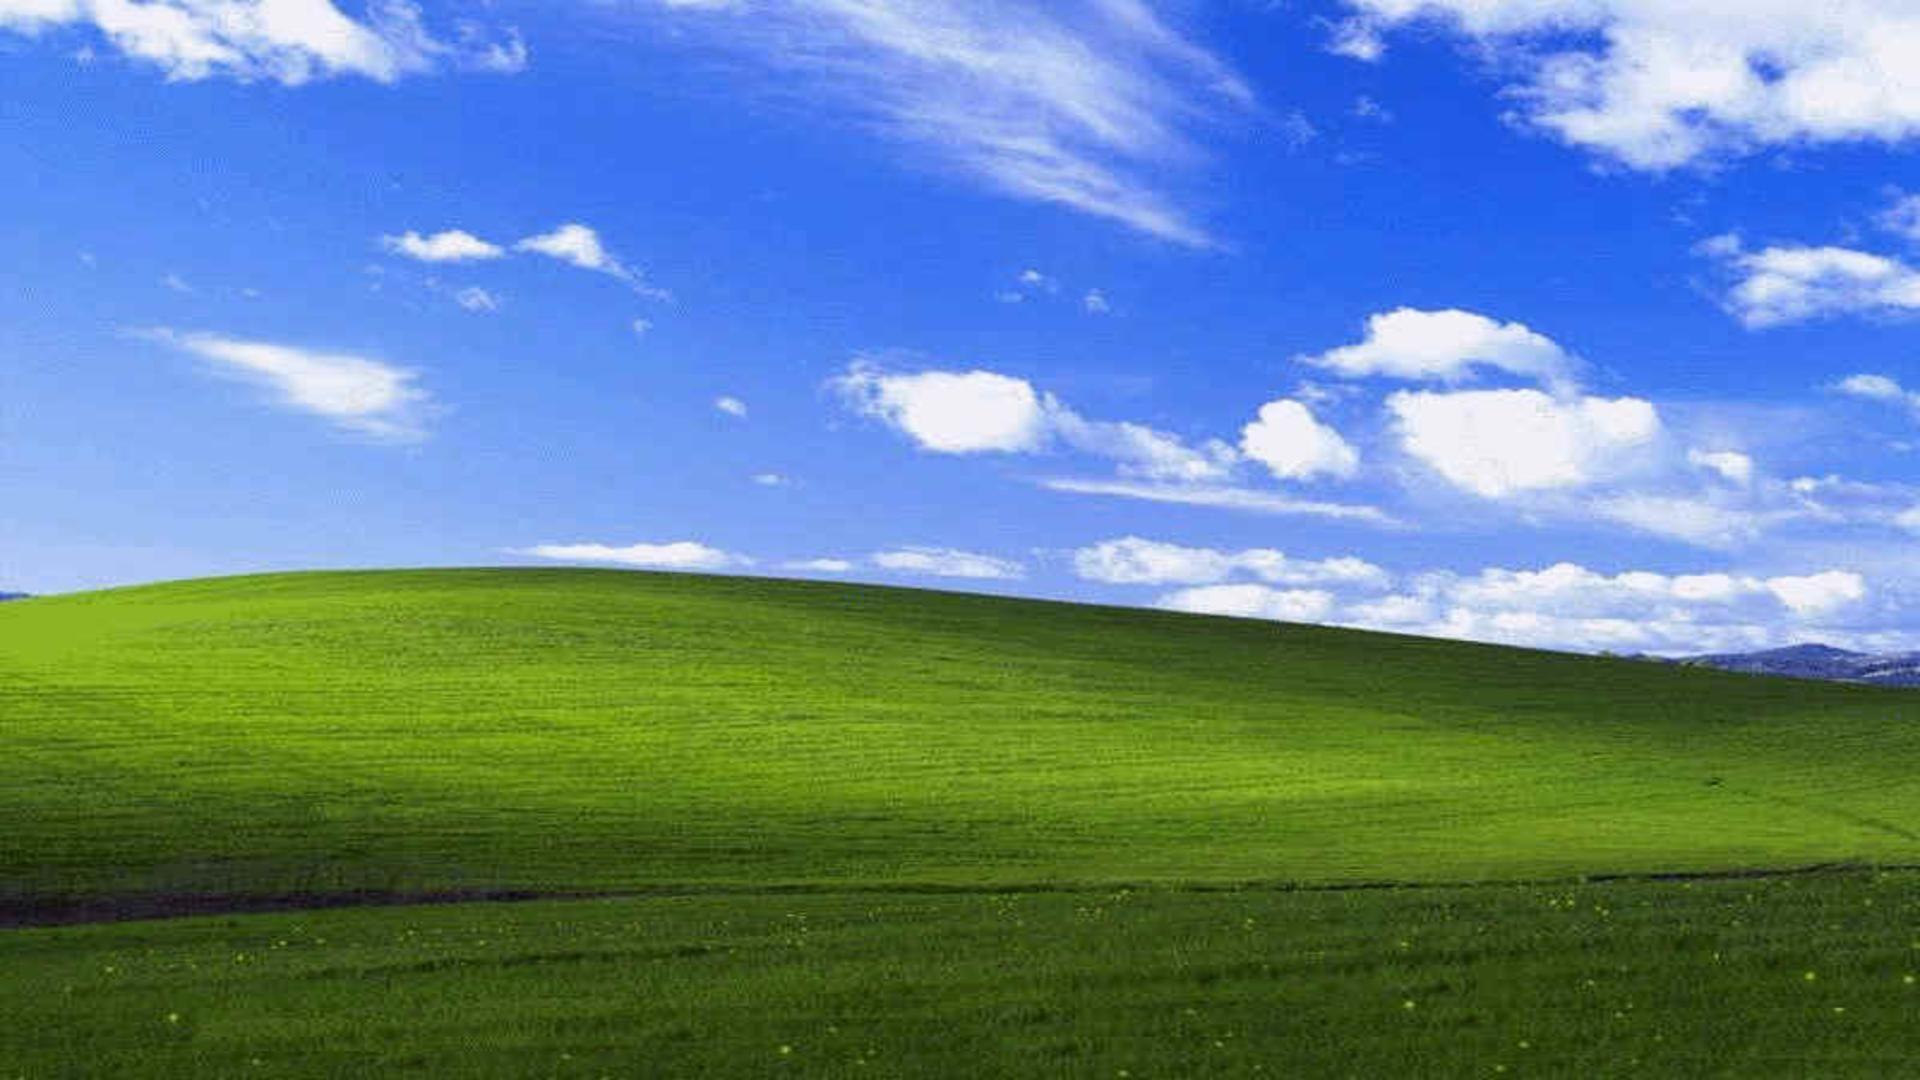 Free Microsoft Desktop Backgrounds - Wallpaper Cave